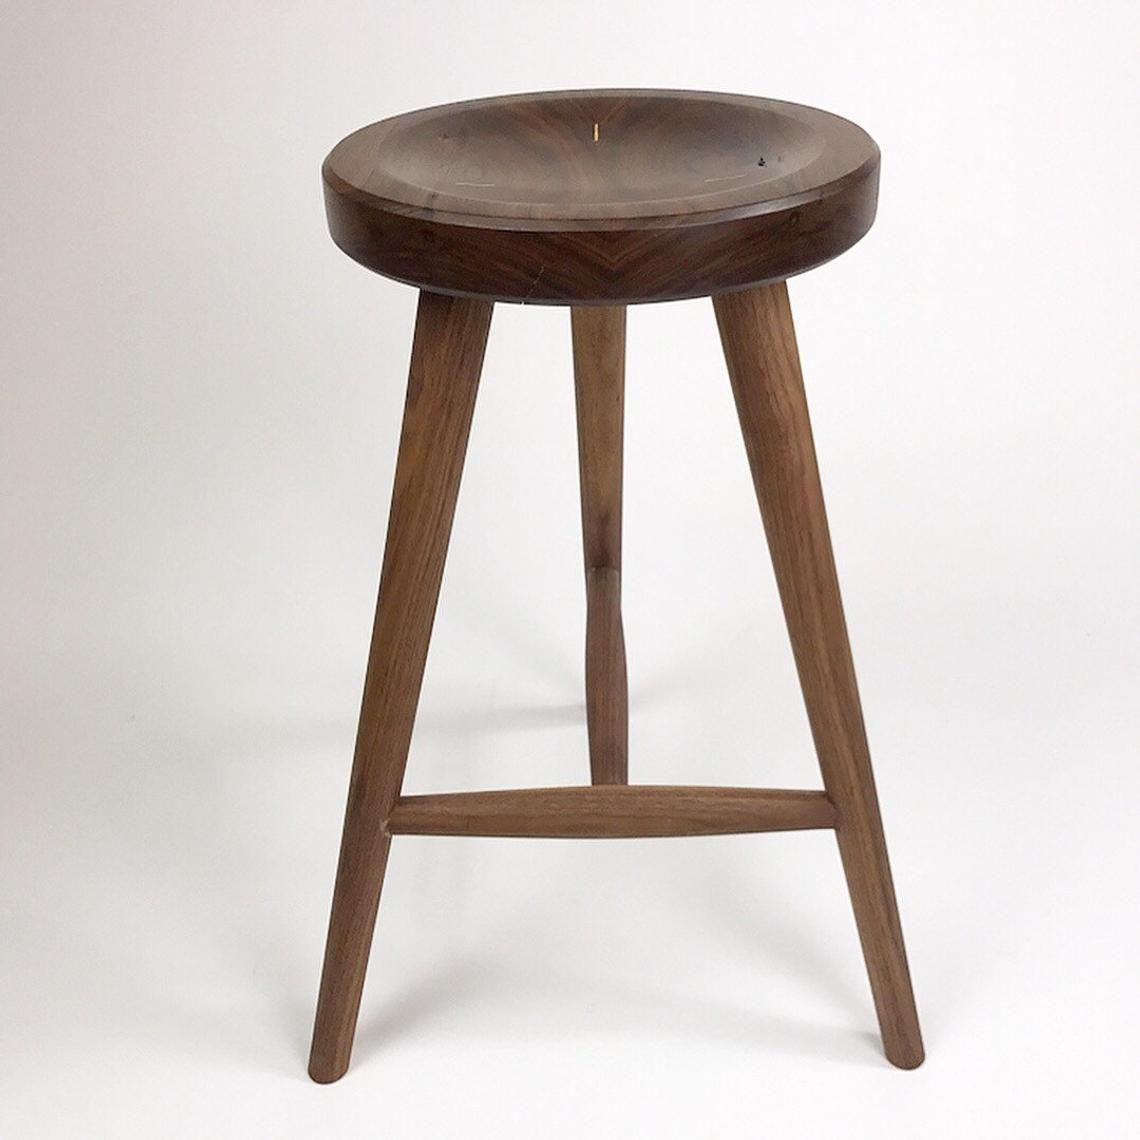 Fabulous Handmade Walnut Stools Custom Stools Wood Stools Bar Bralicious Painted Fabric Chair Ideas Braliciousco